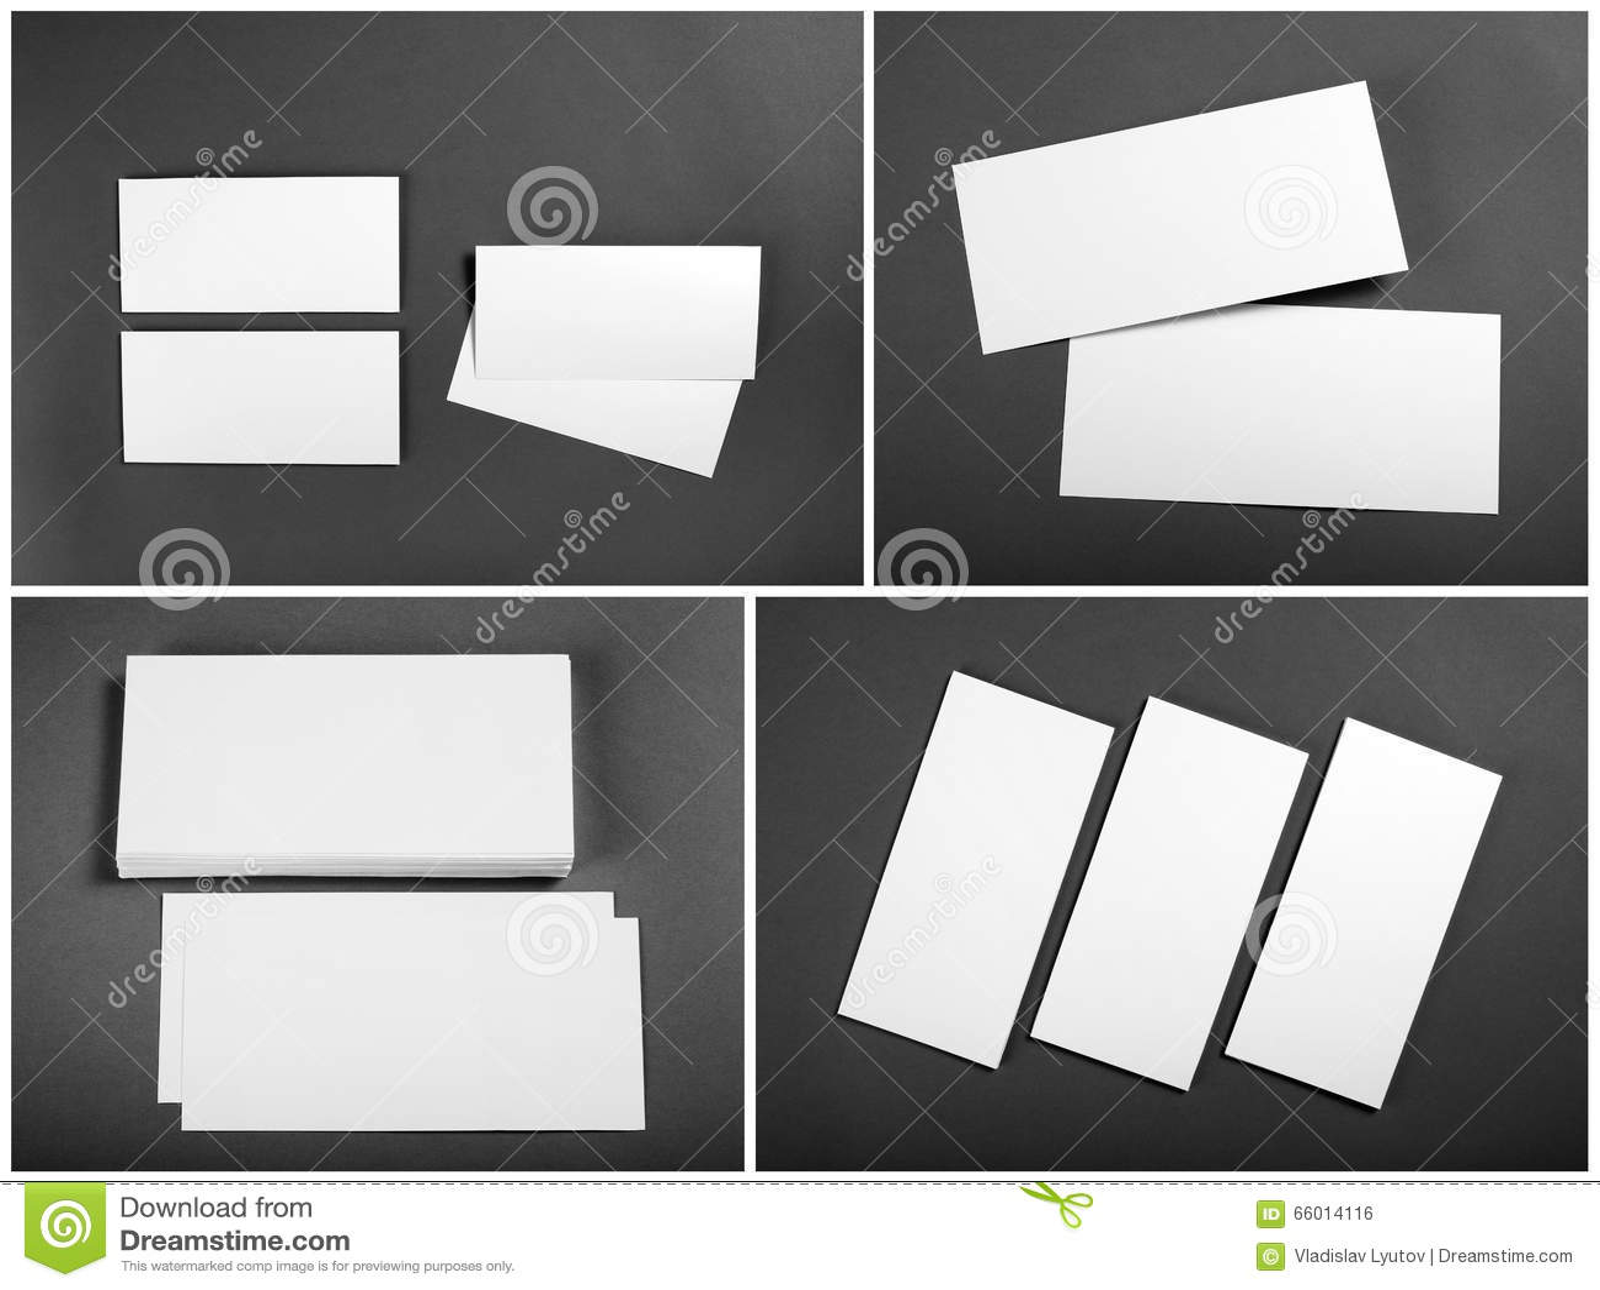 Set of Blank white flyers over gray background. Identity design.